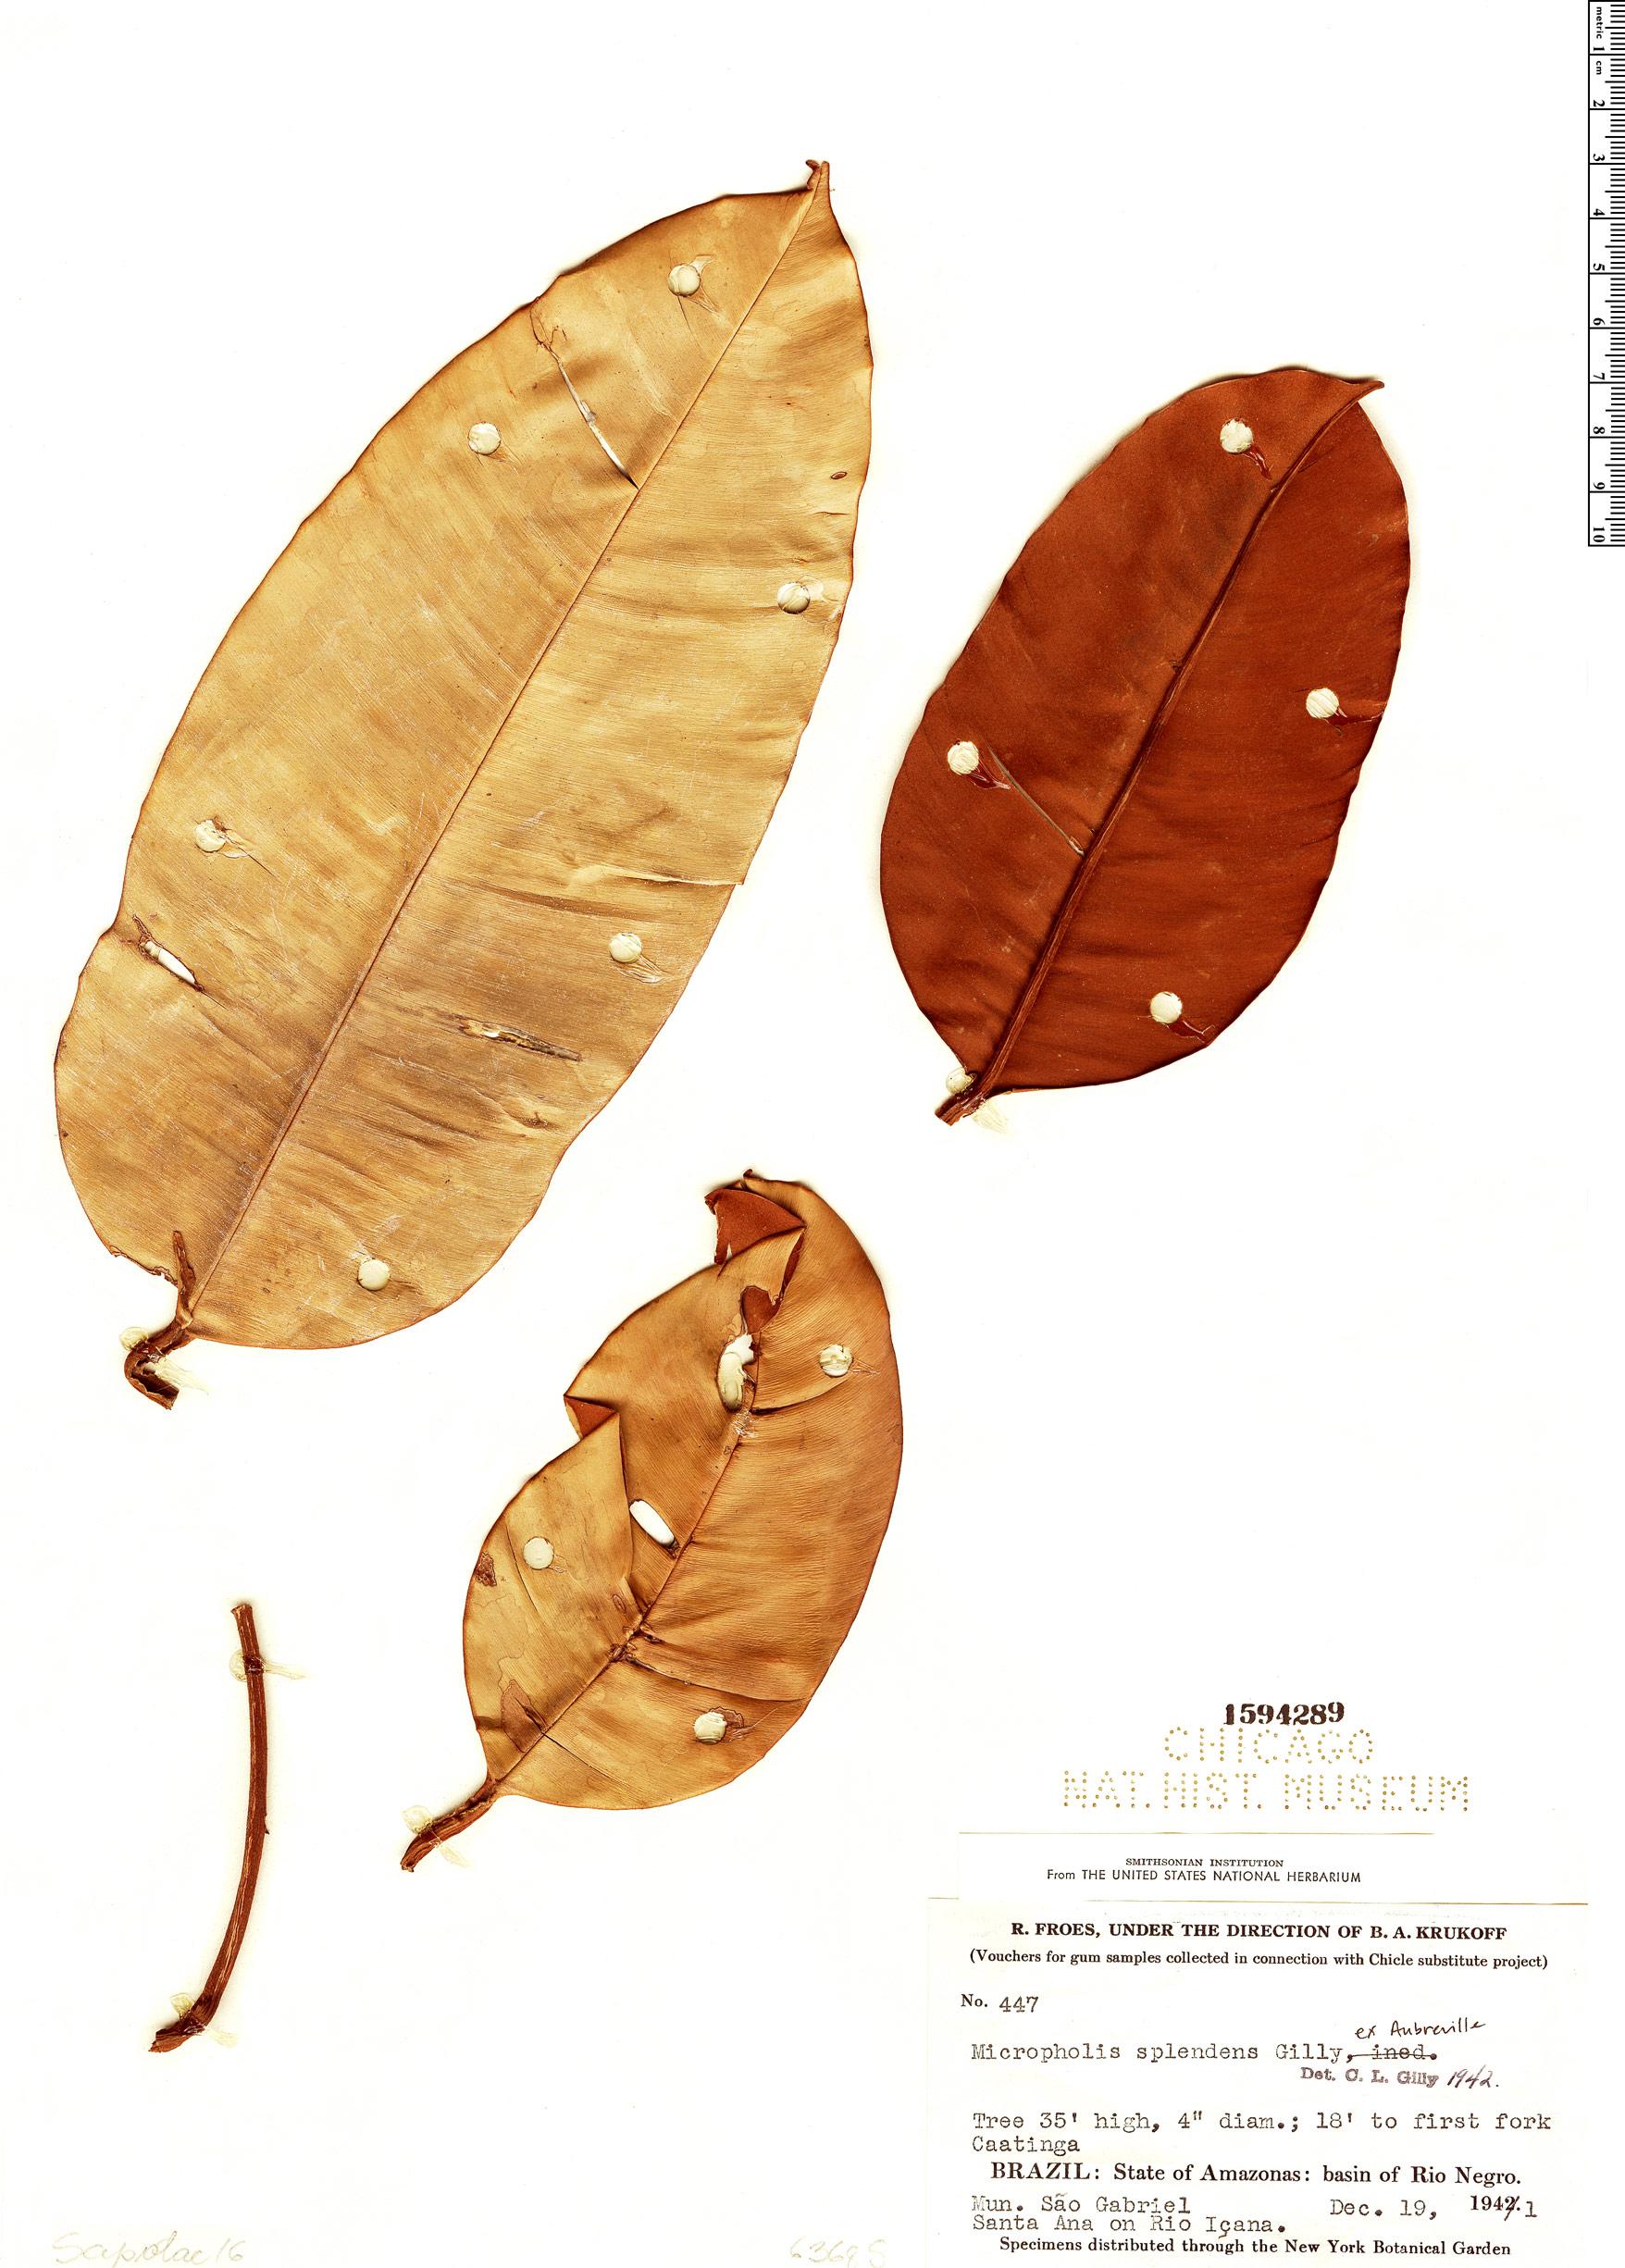 Specimen: Micropholis splendens